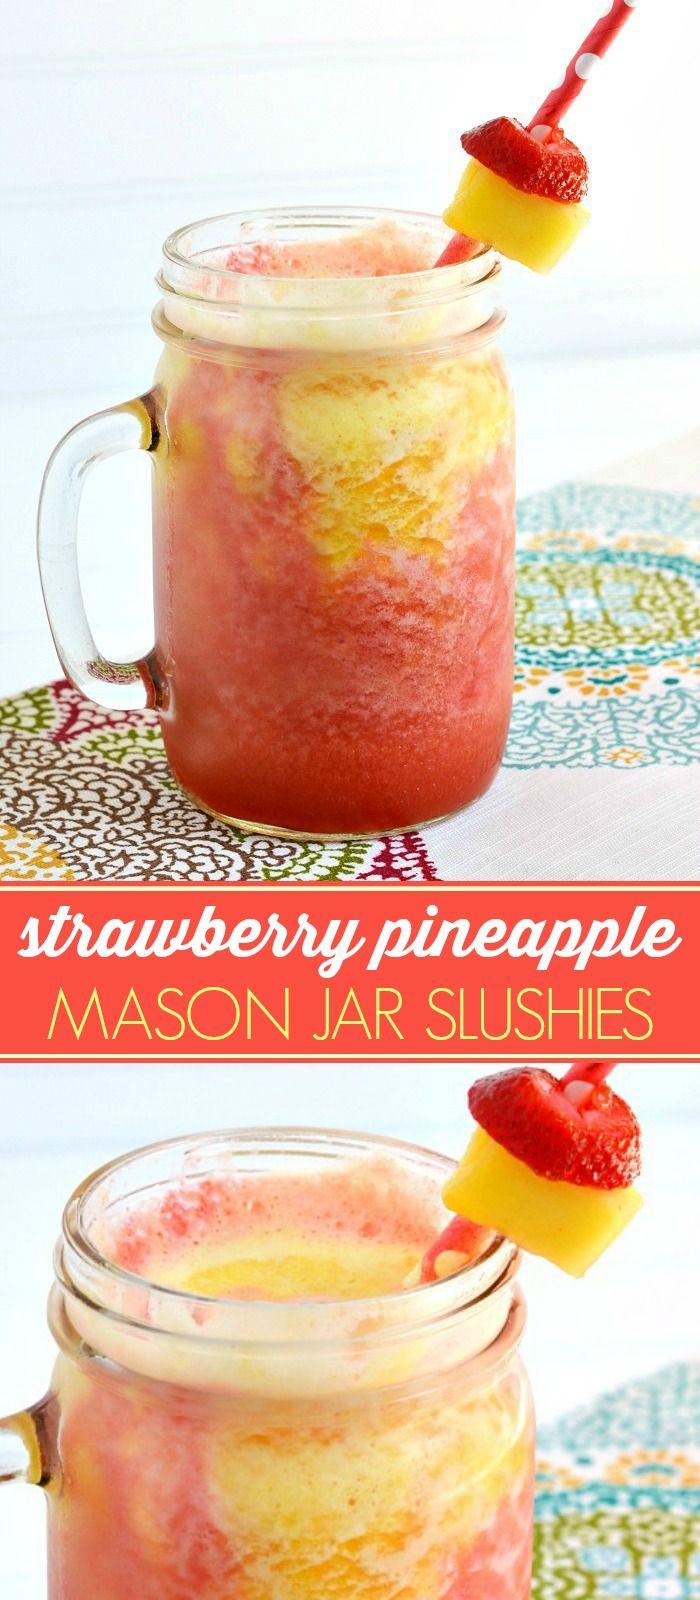 Summer Strawberry Pineapple Mason Jar Slushy Recipe